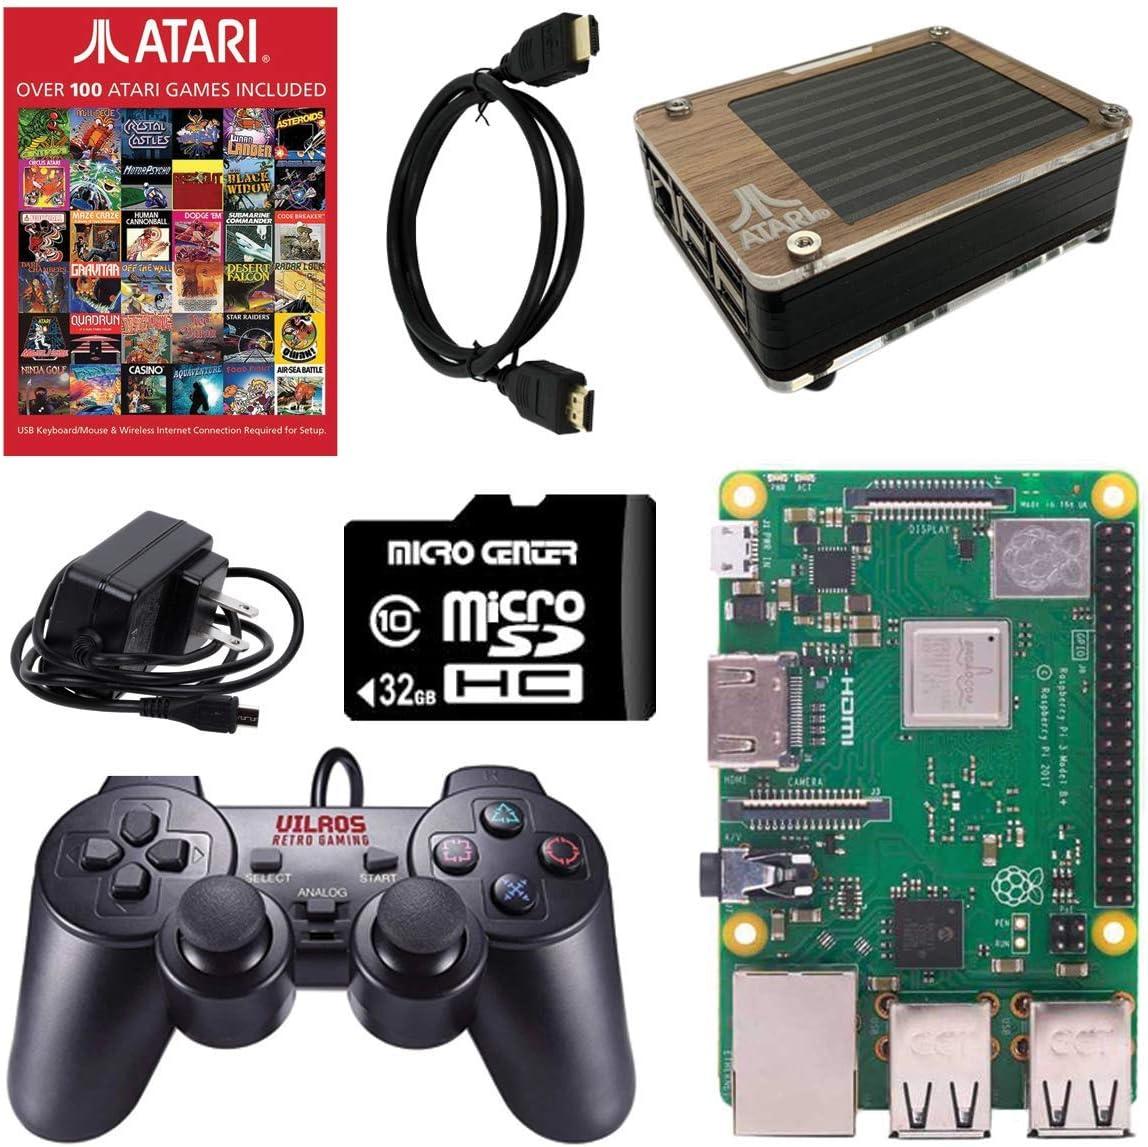 Atari Raspberry Pi 3 Model B+ Retro Arcade Gaming Kit with Pi 3B+, USB Gamepads, 100+ Licensed Atari Games Micro SD Card, Power Supply, Atari Pi Case, HDMI Cable and Starter Guide